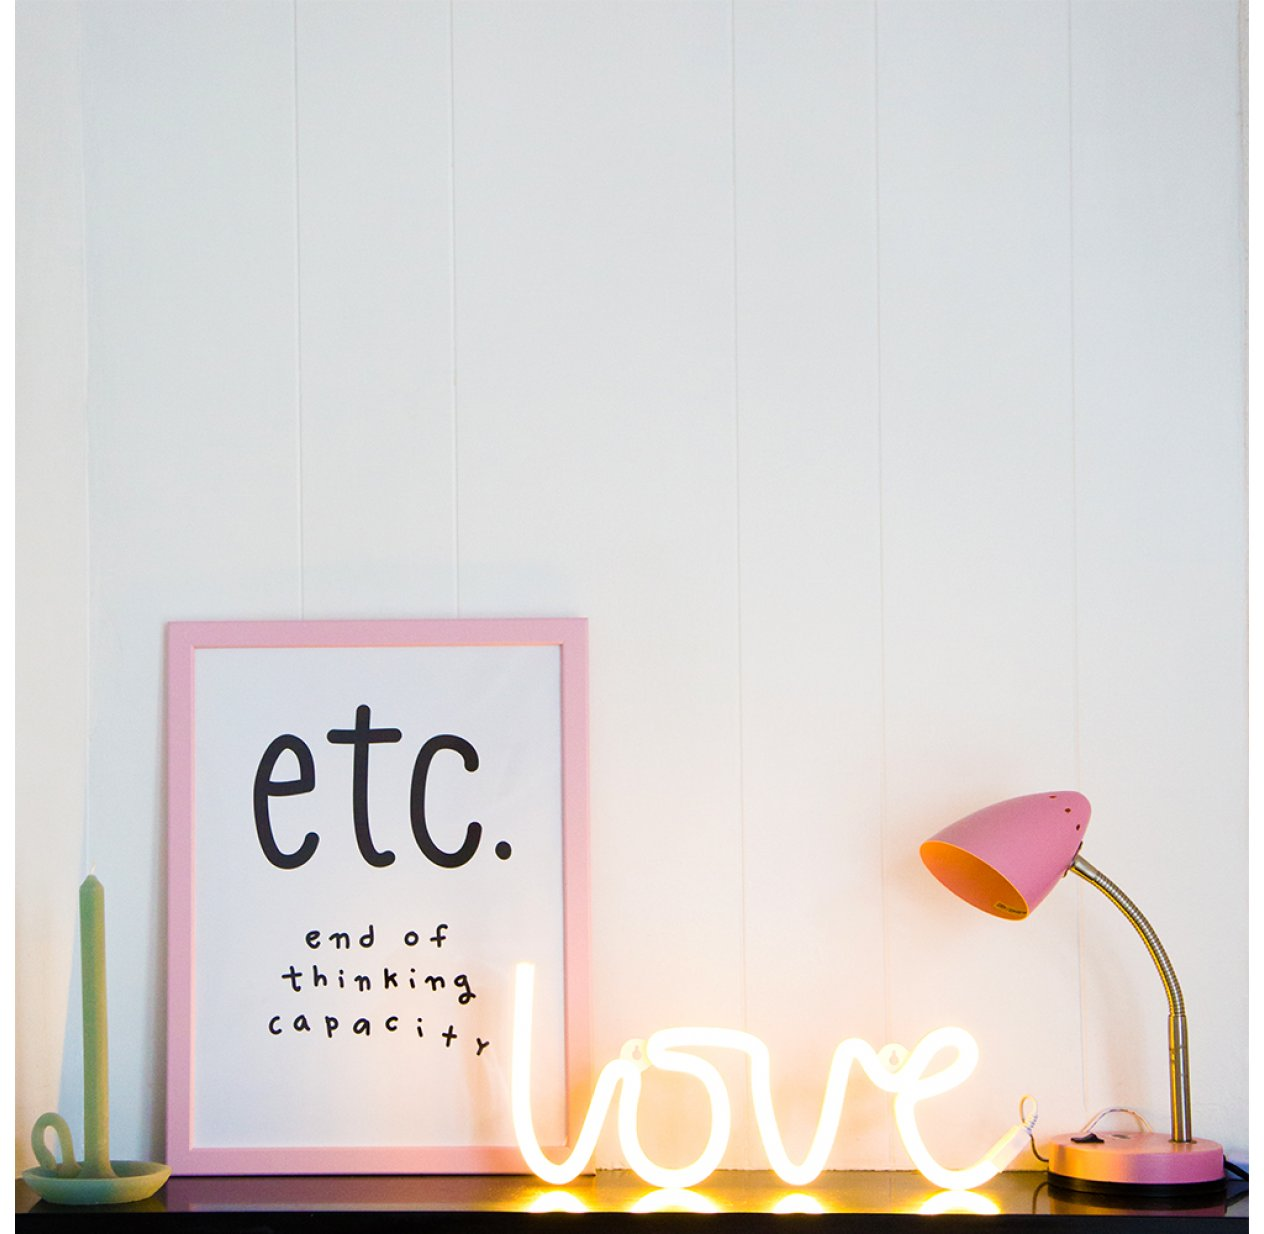 Neon A Accrocher Au Mur lampe murale néon love - jaune